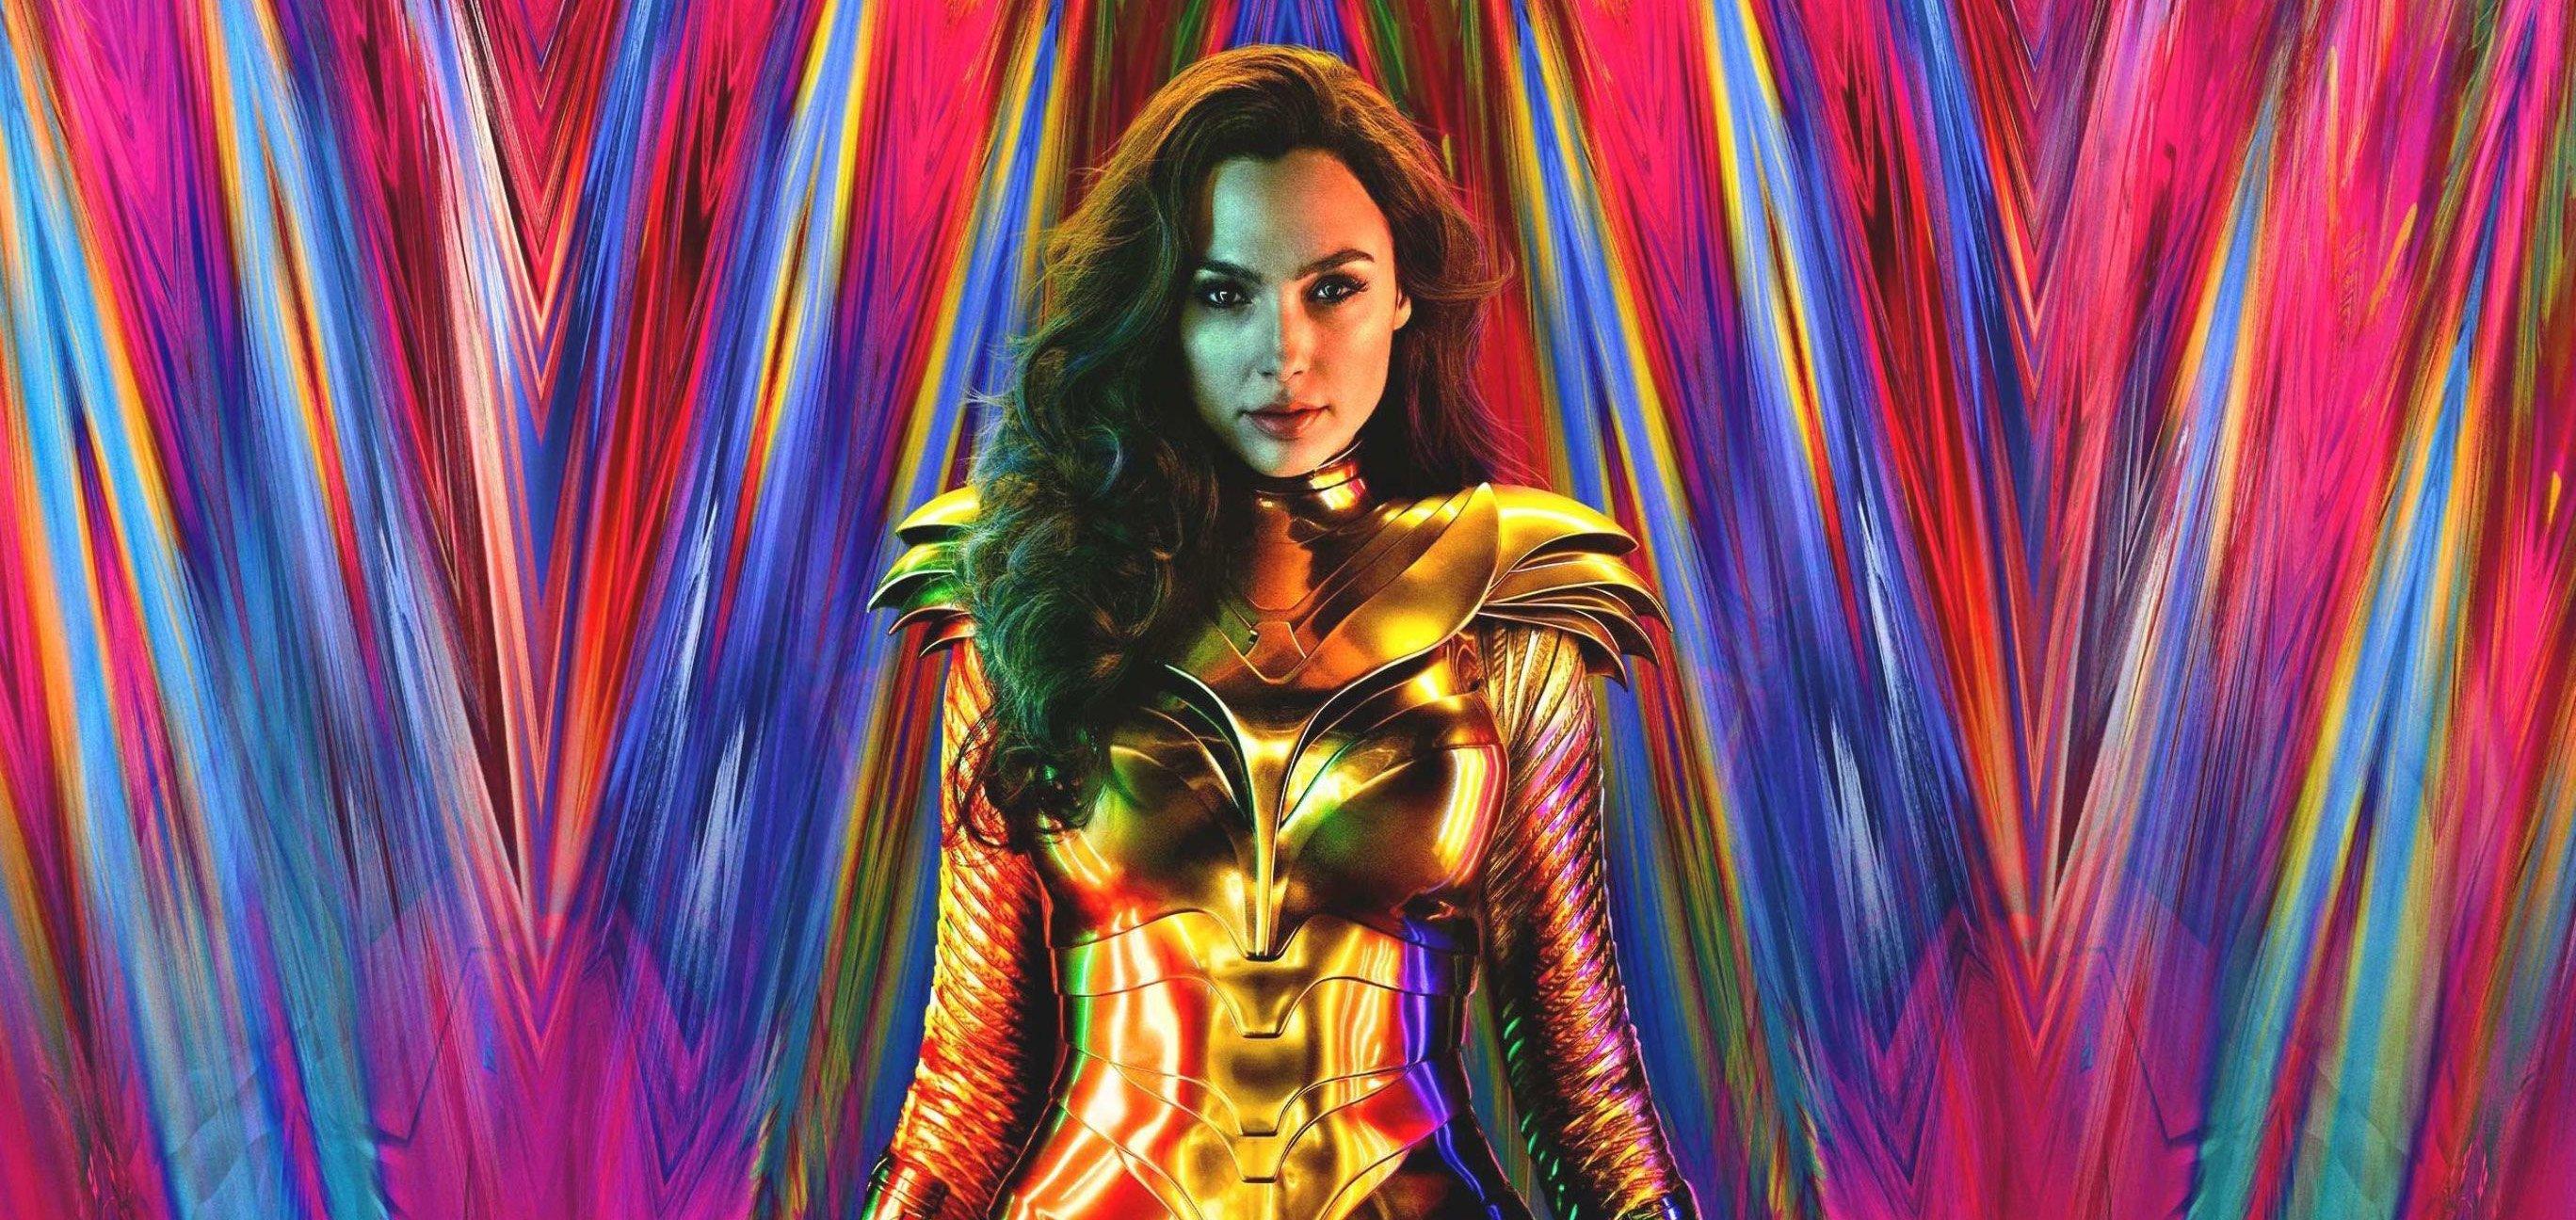 Wonder Woman 1984 (2020) - hero image